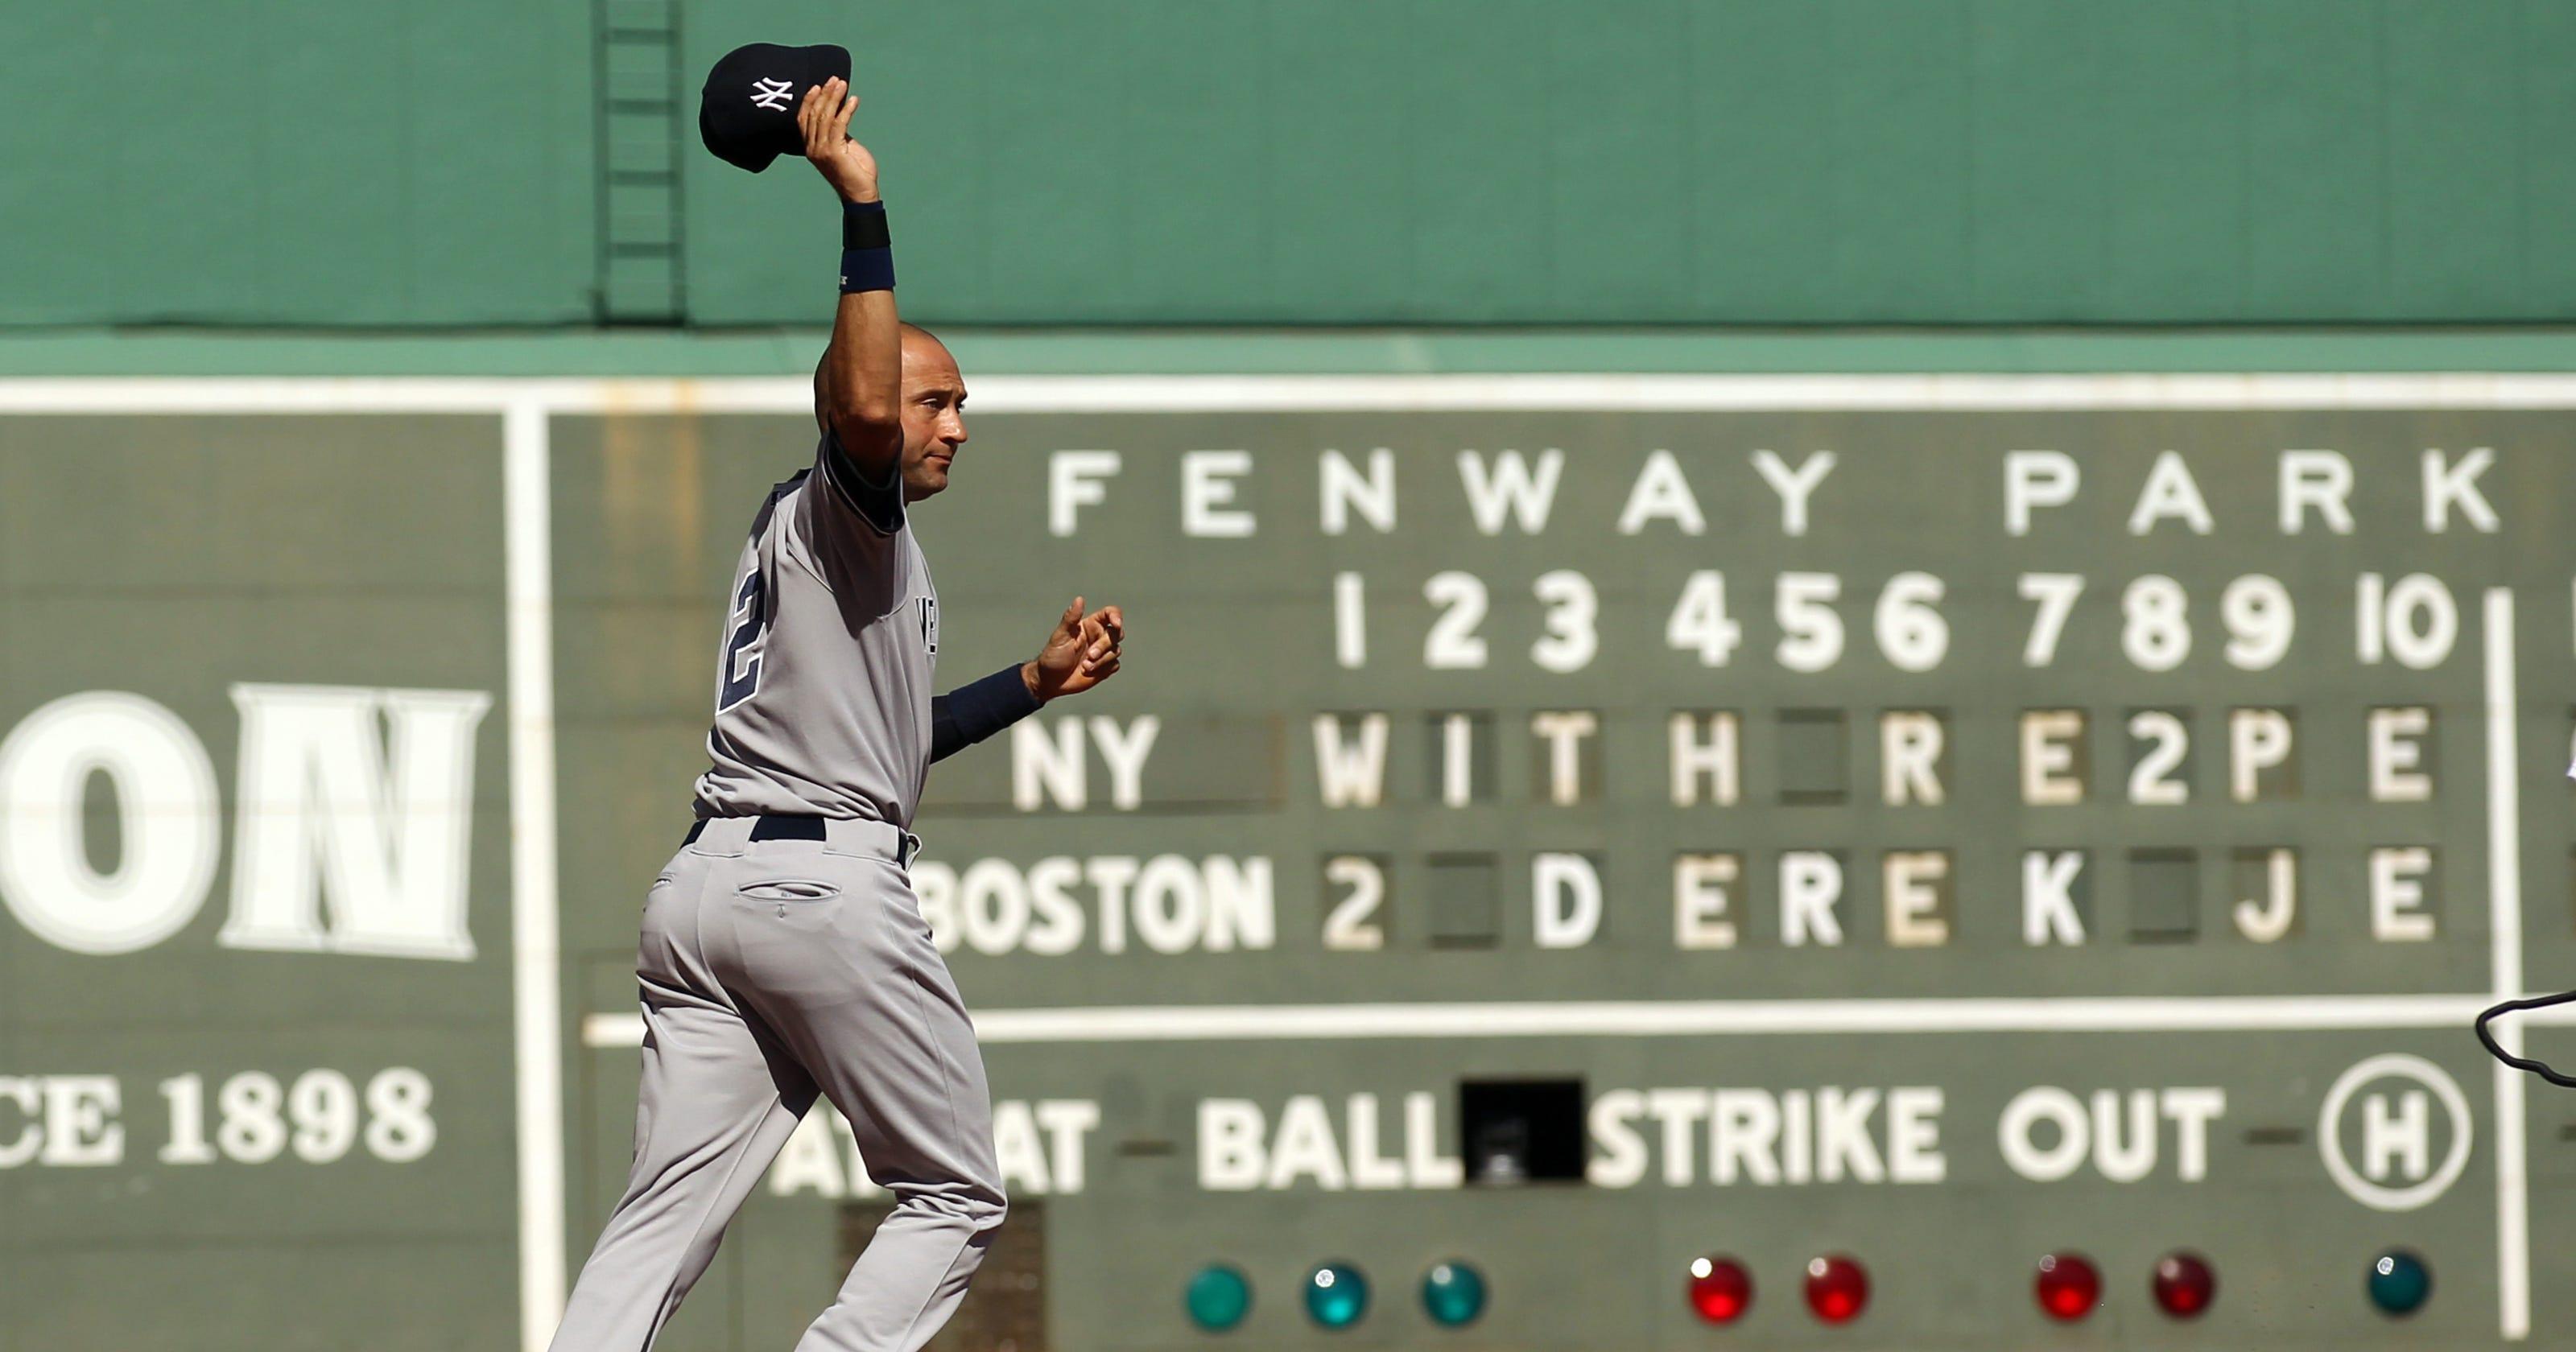 5f5caad73b1 PHOTOS: Derek Jeter's career ends with hit, Yankees win